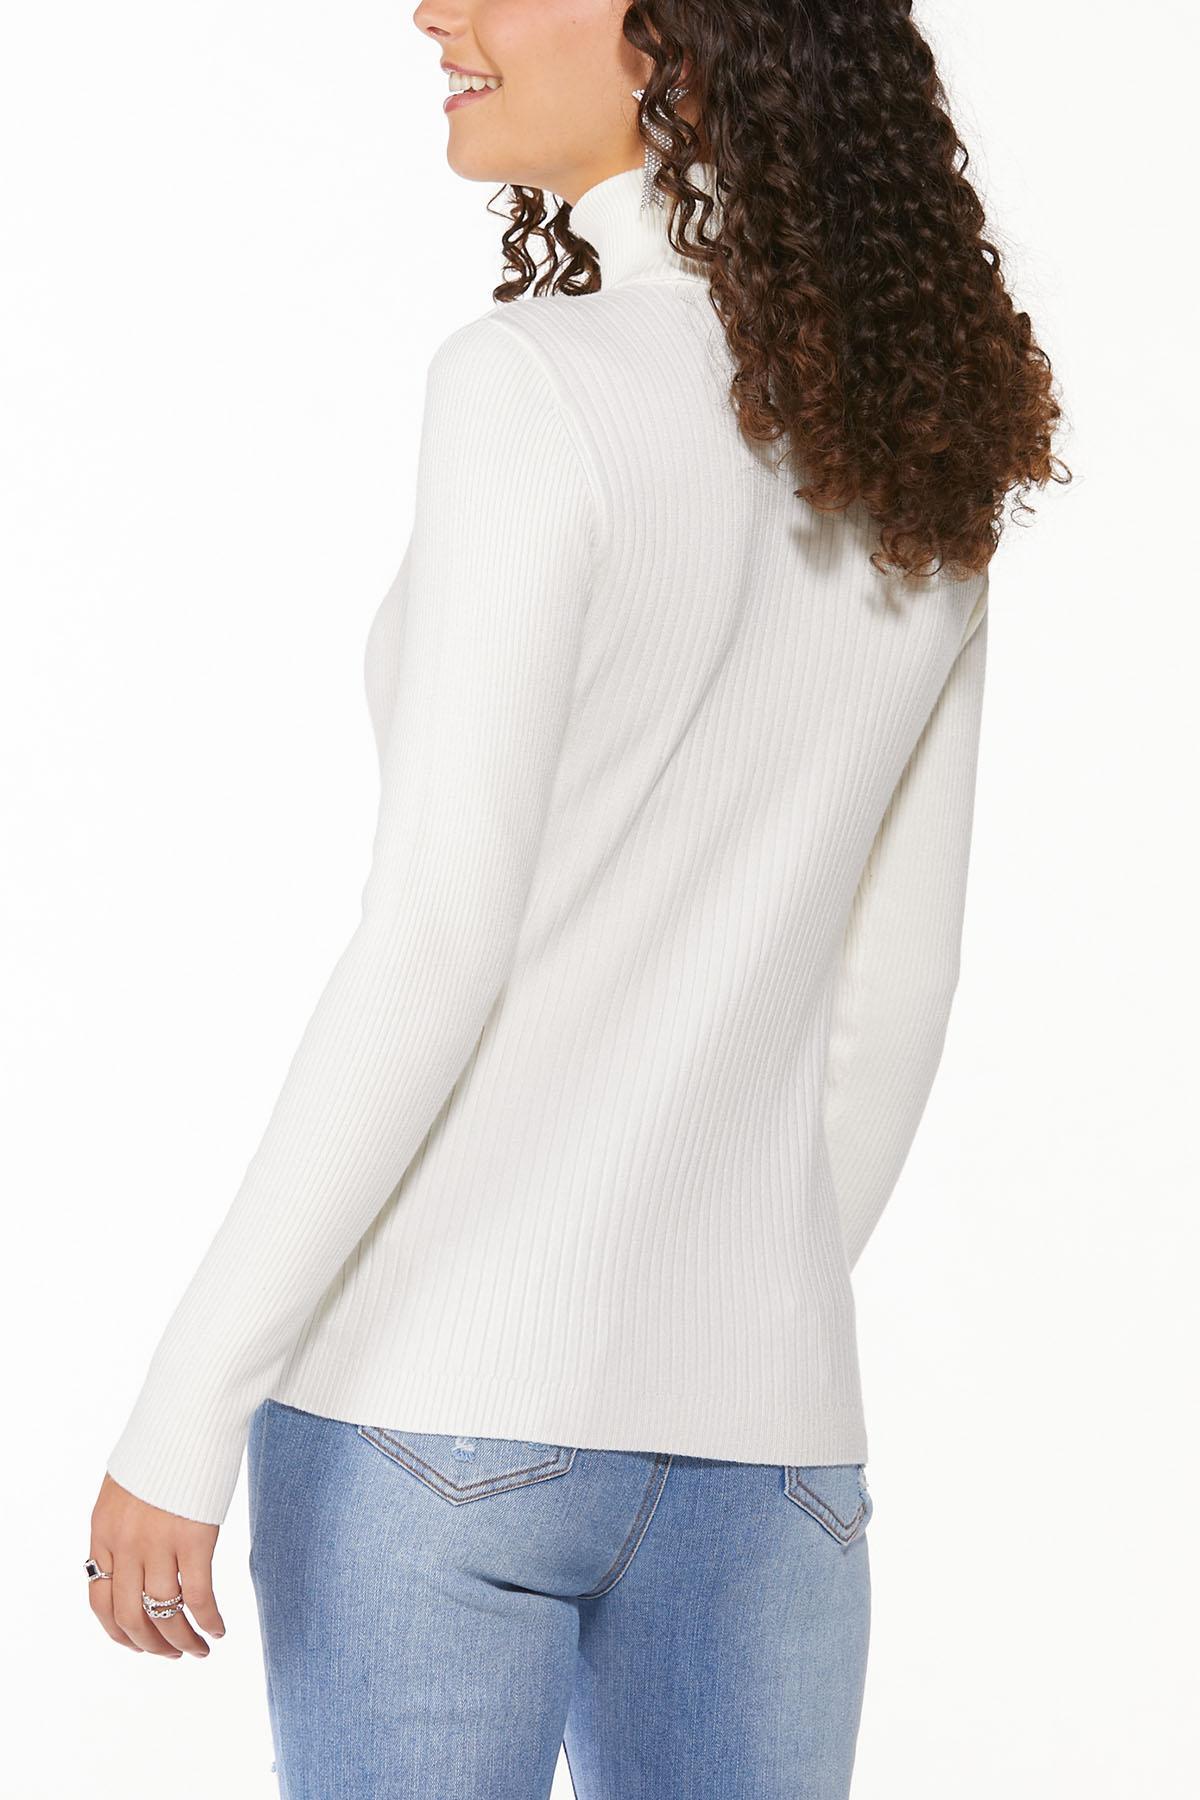 Ribbed Turtleneck Sweater (Item #44646872)